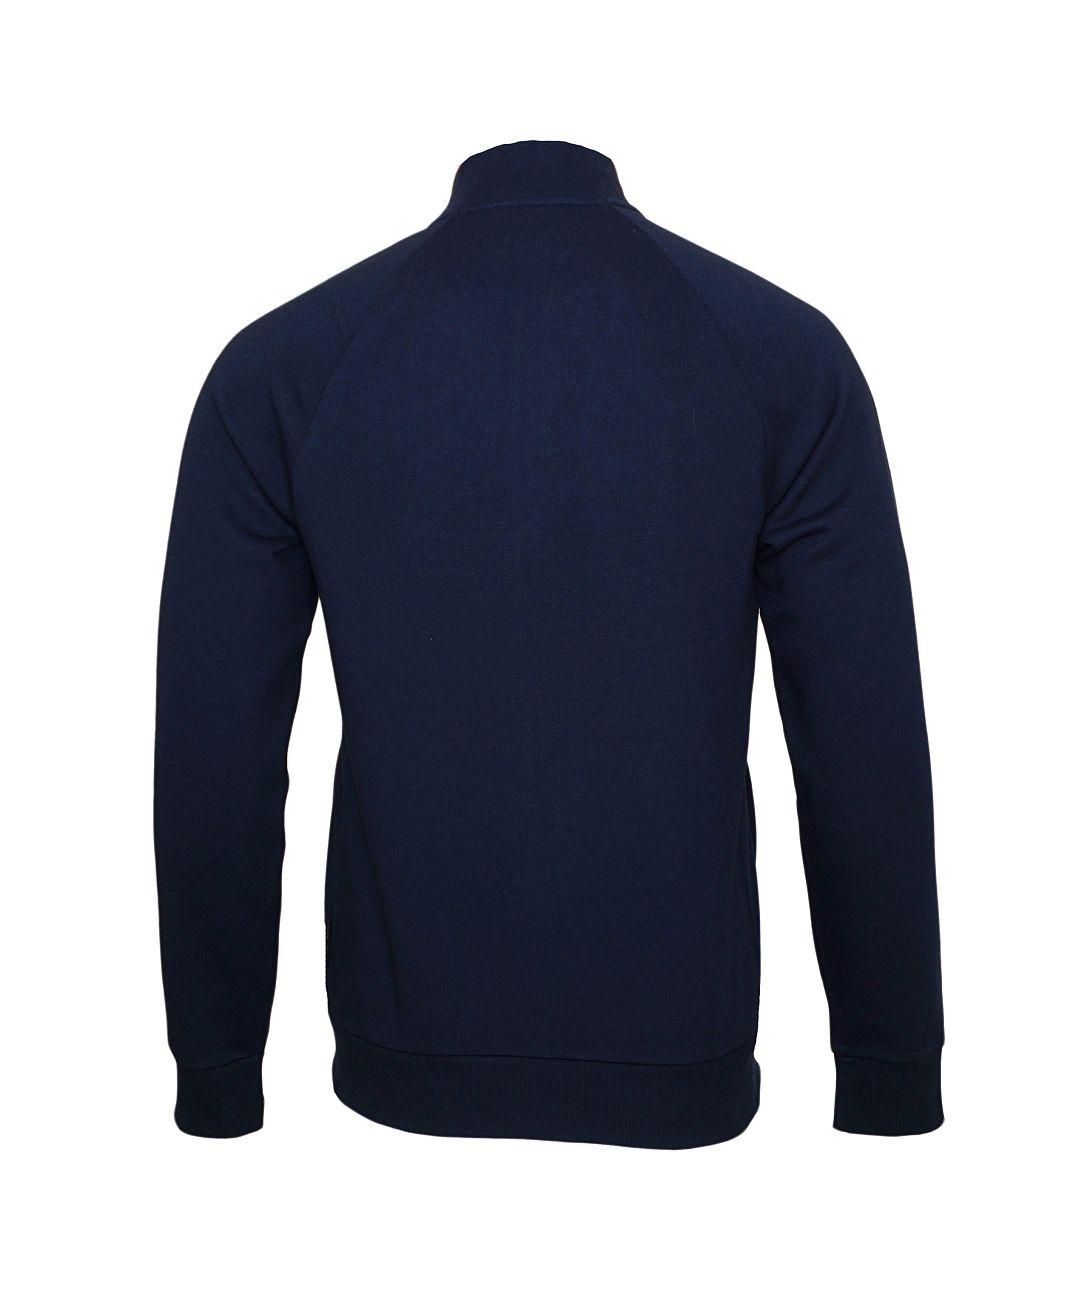 Emporio Armani Sweater Jacke mit Reißverschluss 111570 8A571 00135 MARINE SH18-EAS1